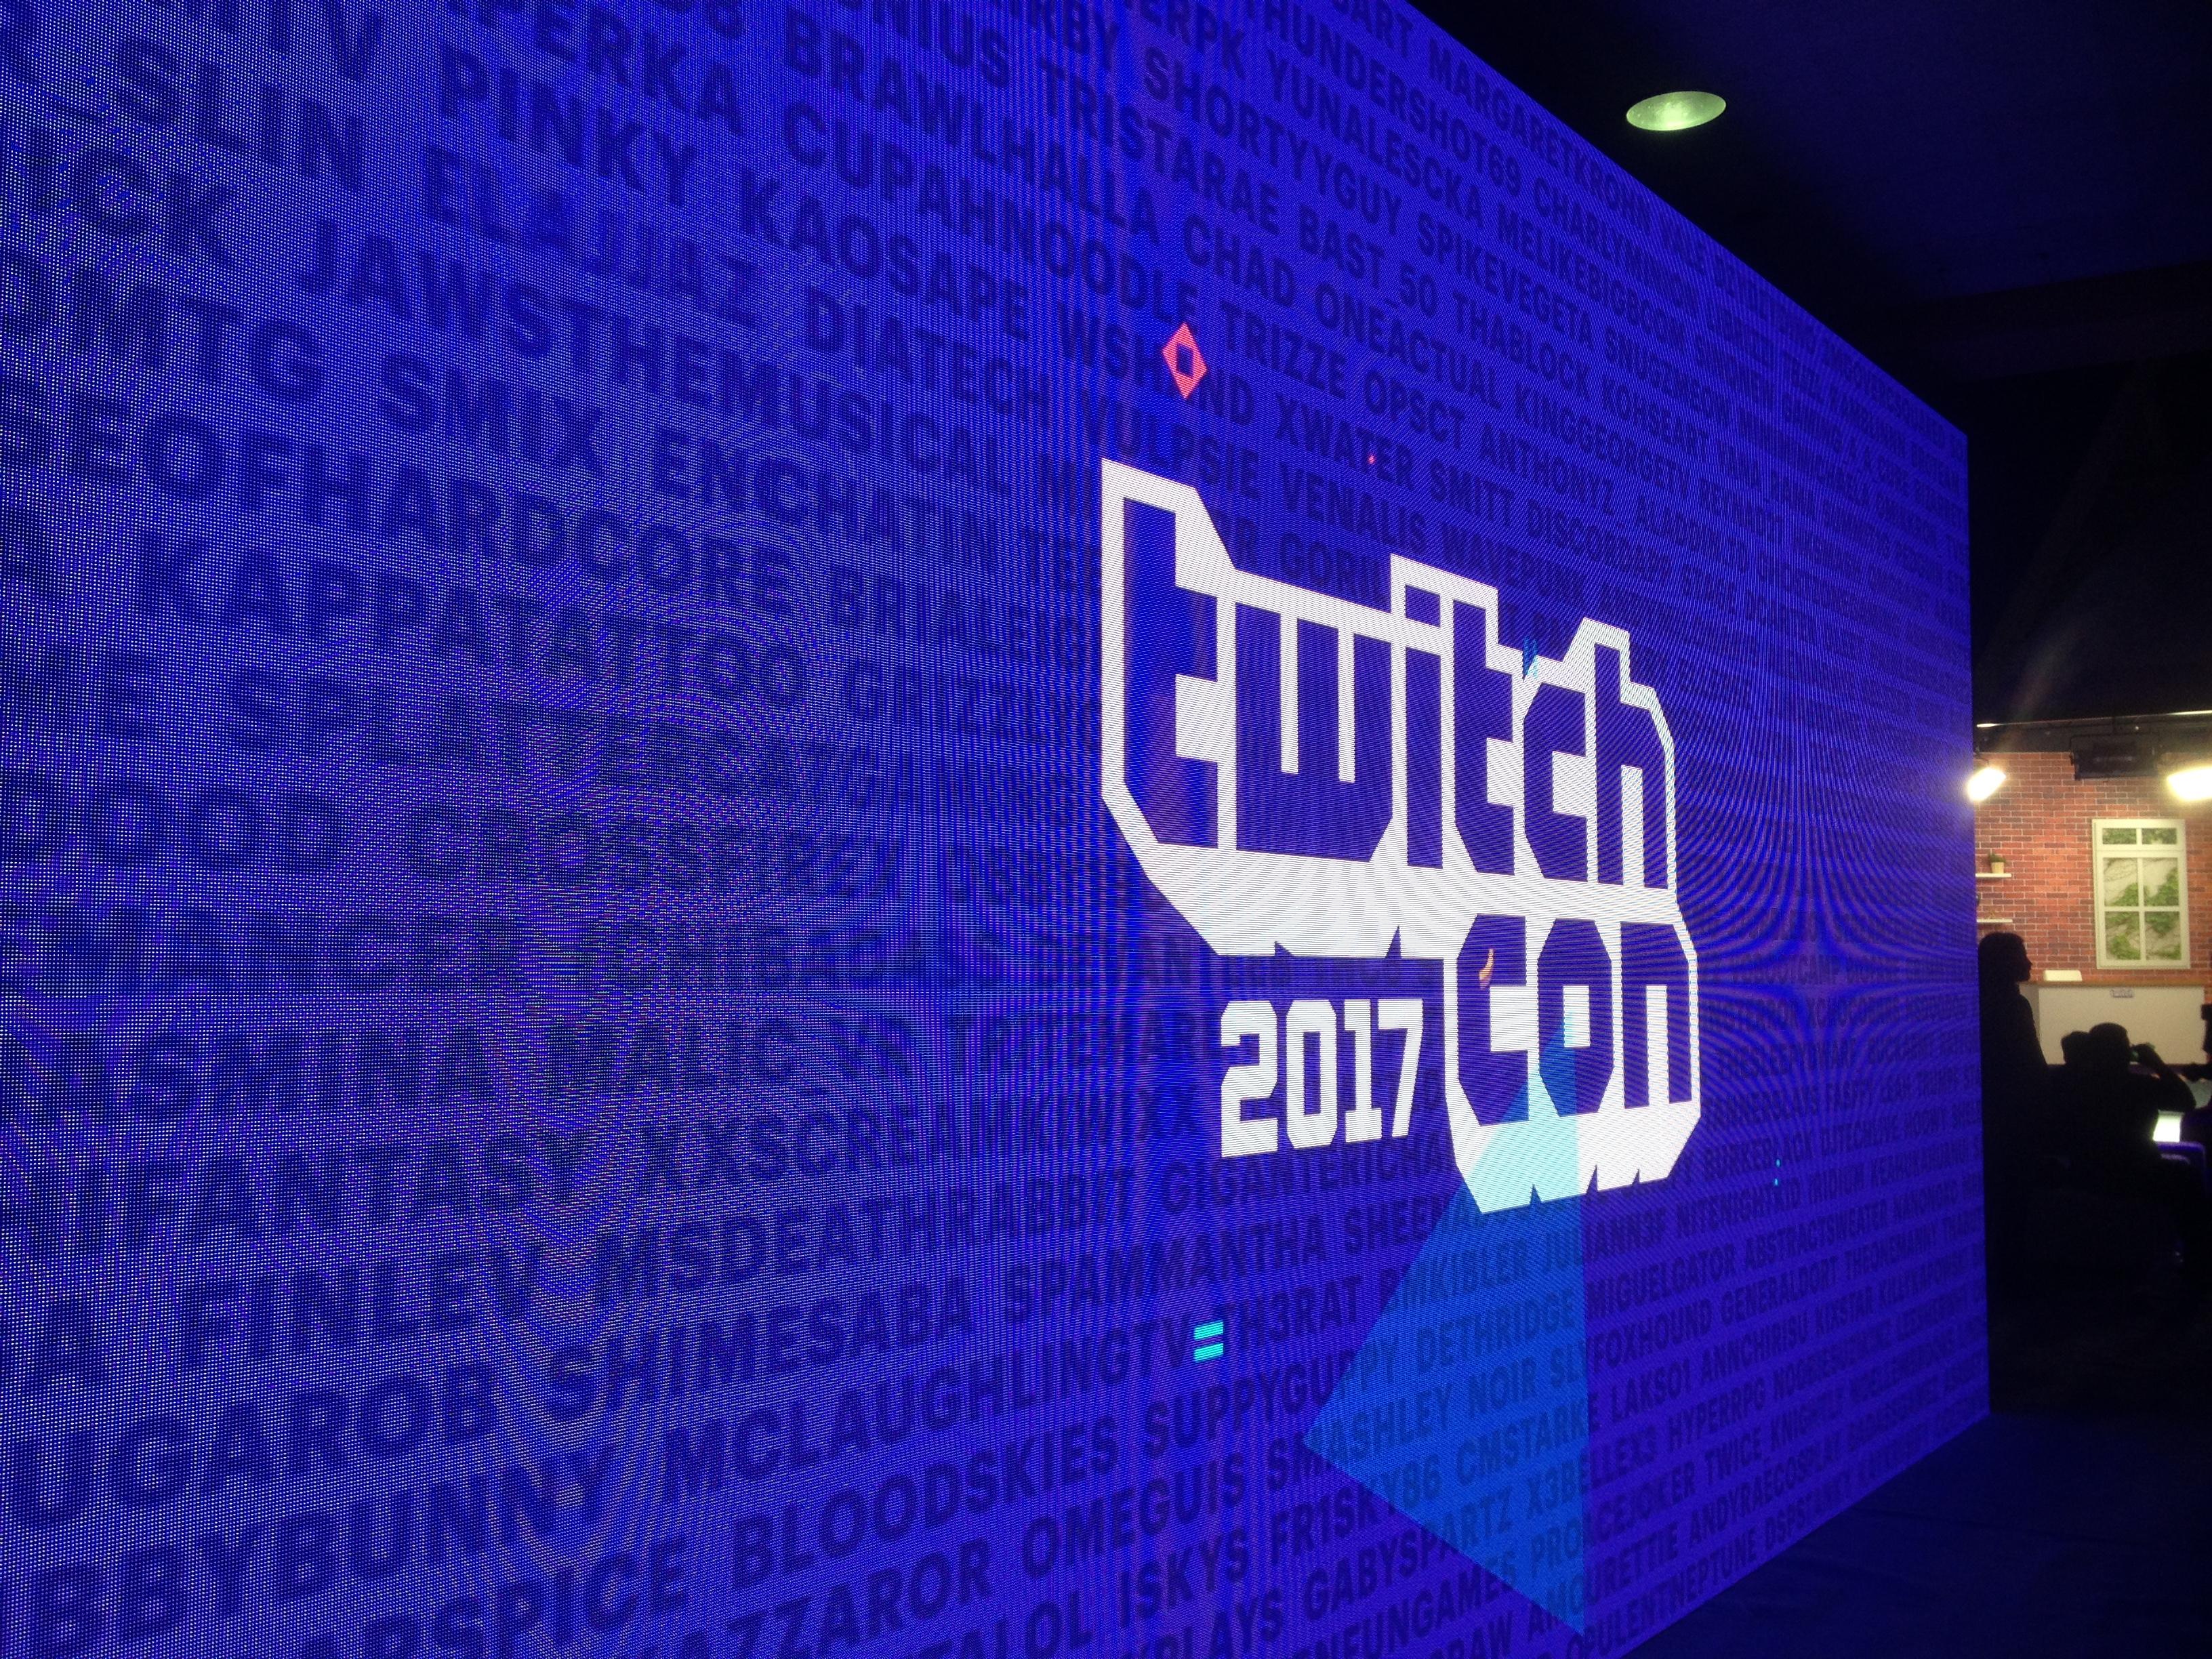 TwitchCon2017 Focuses On Celebrating Community